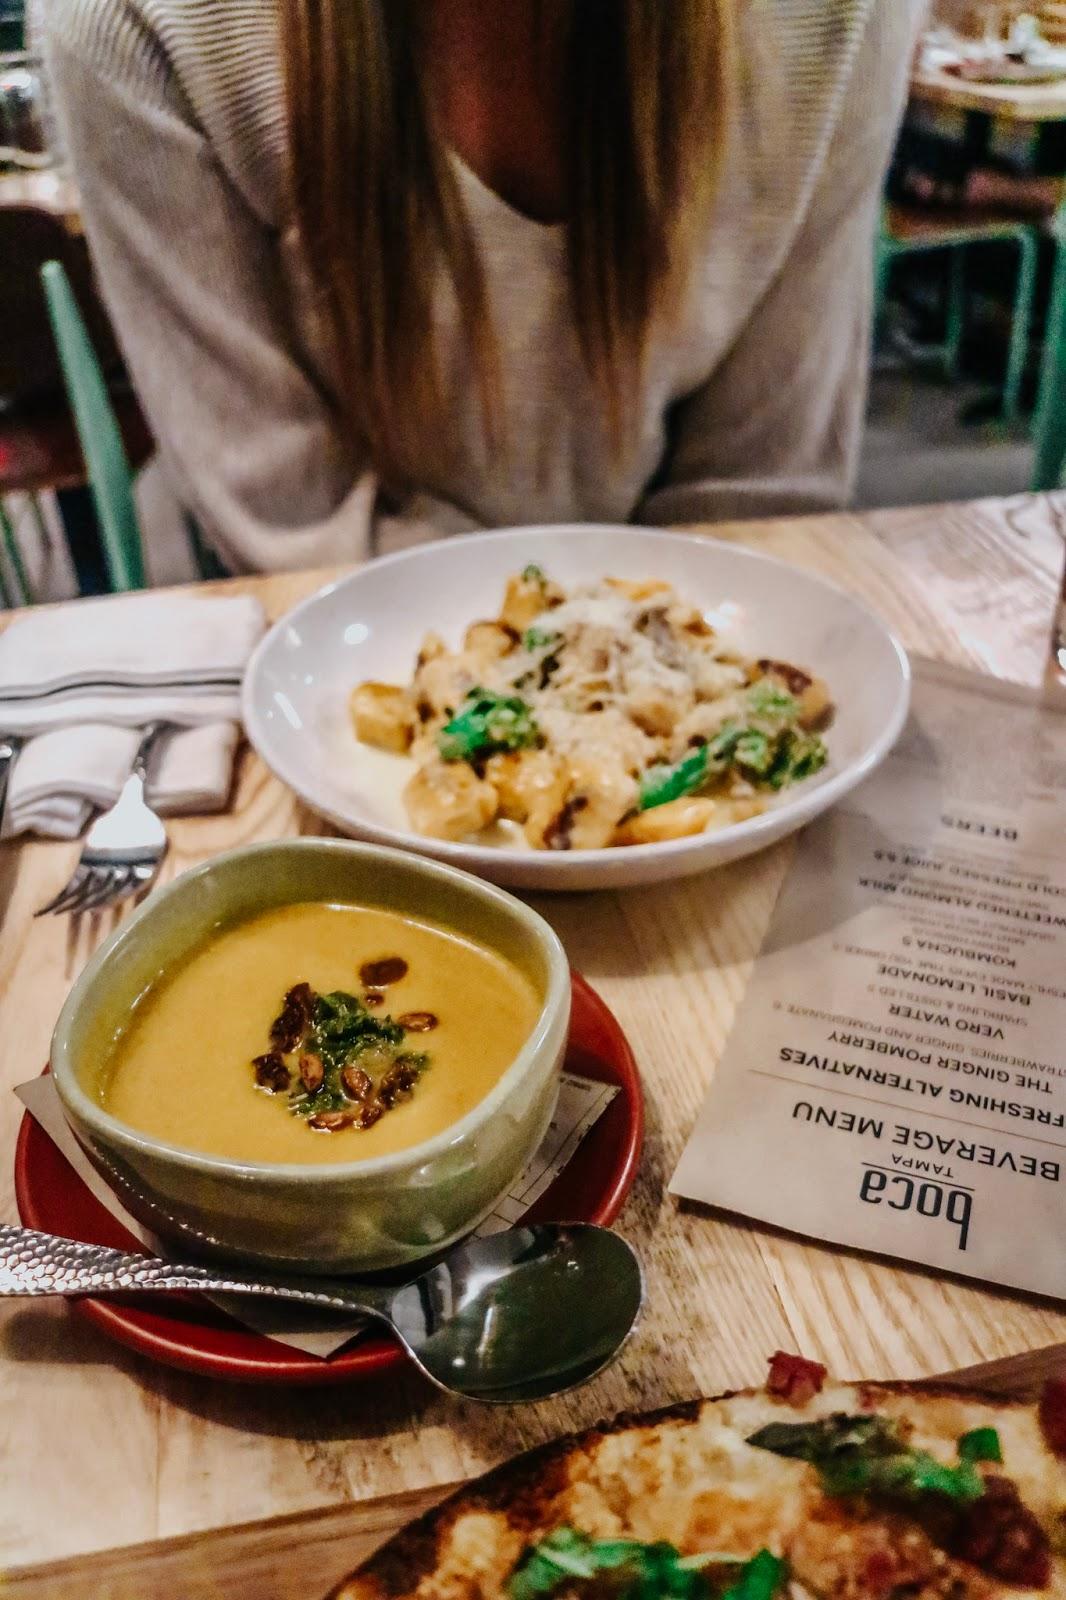 Autumn butternut squash soup at boca in Tampa Florida